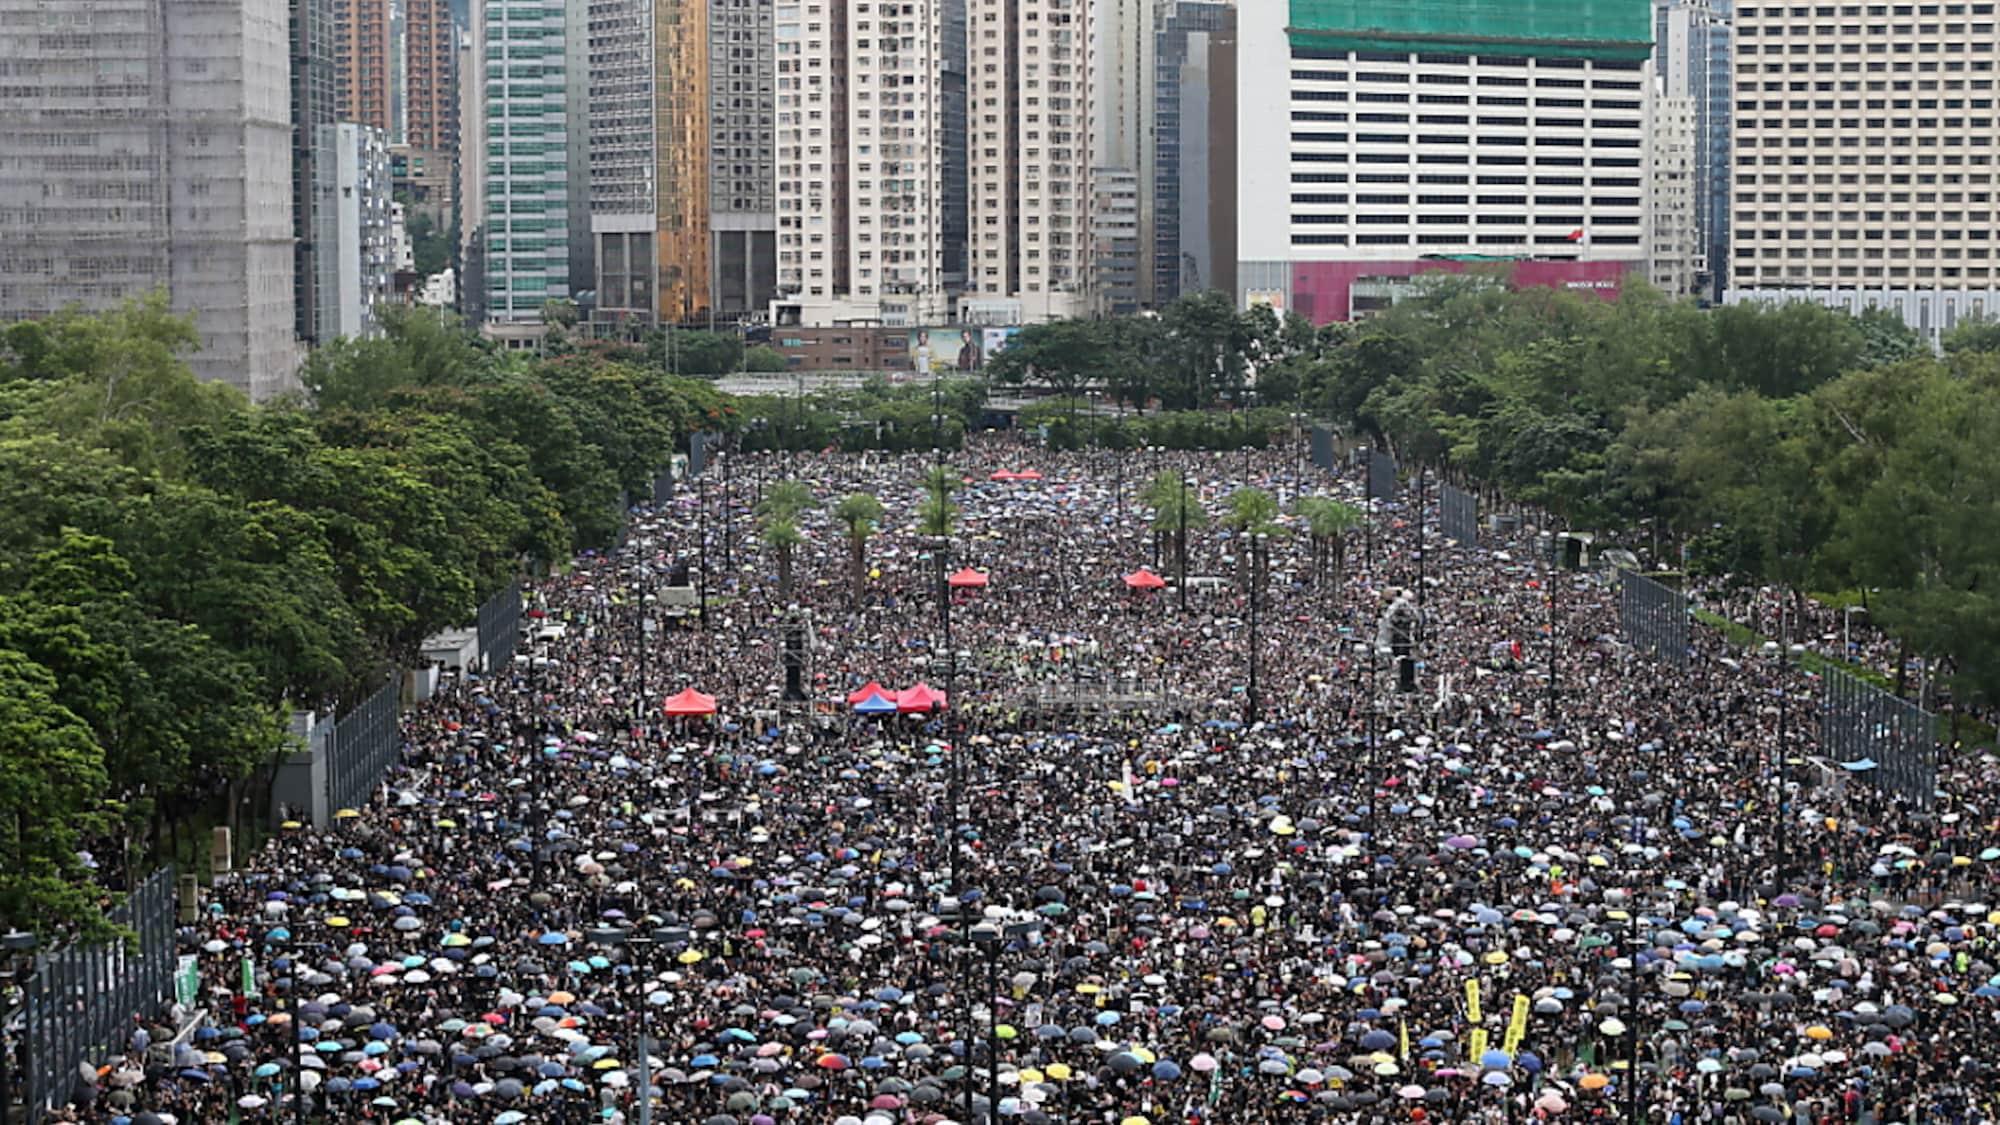 Massenproteste in Hongkong: Trump warnt China vor Gewalt wie bei Tiananmen